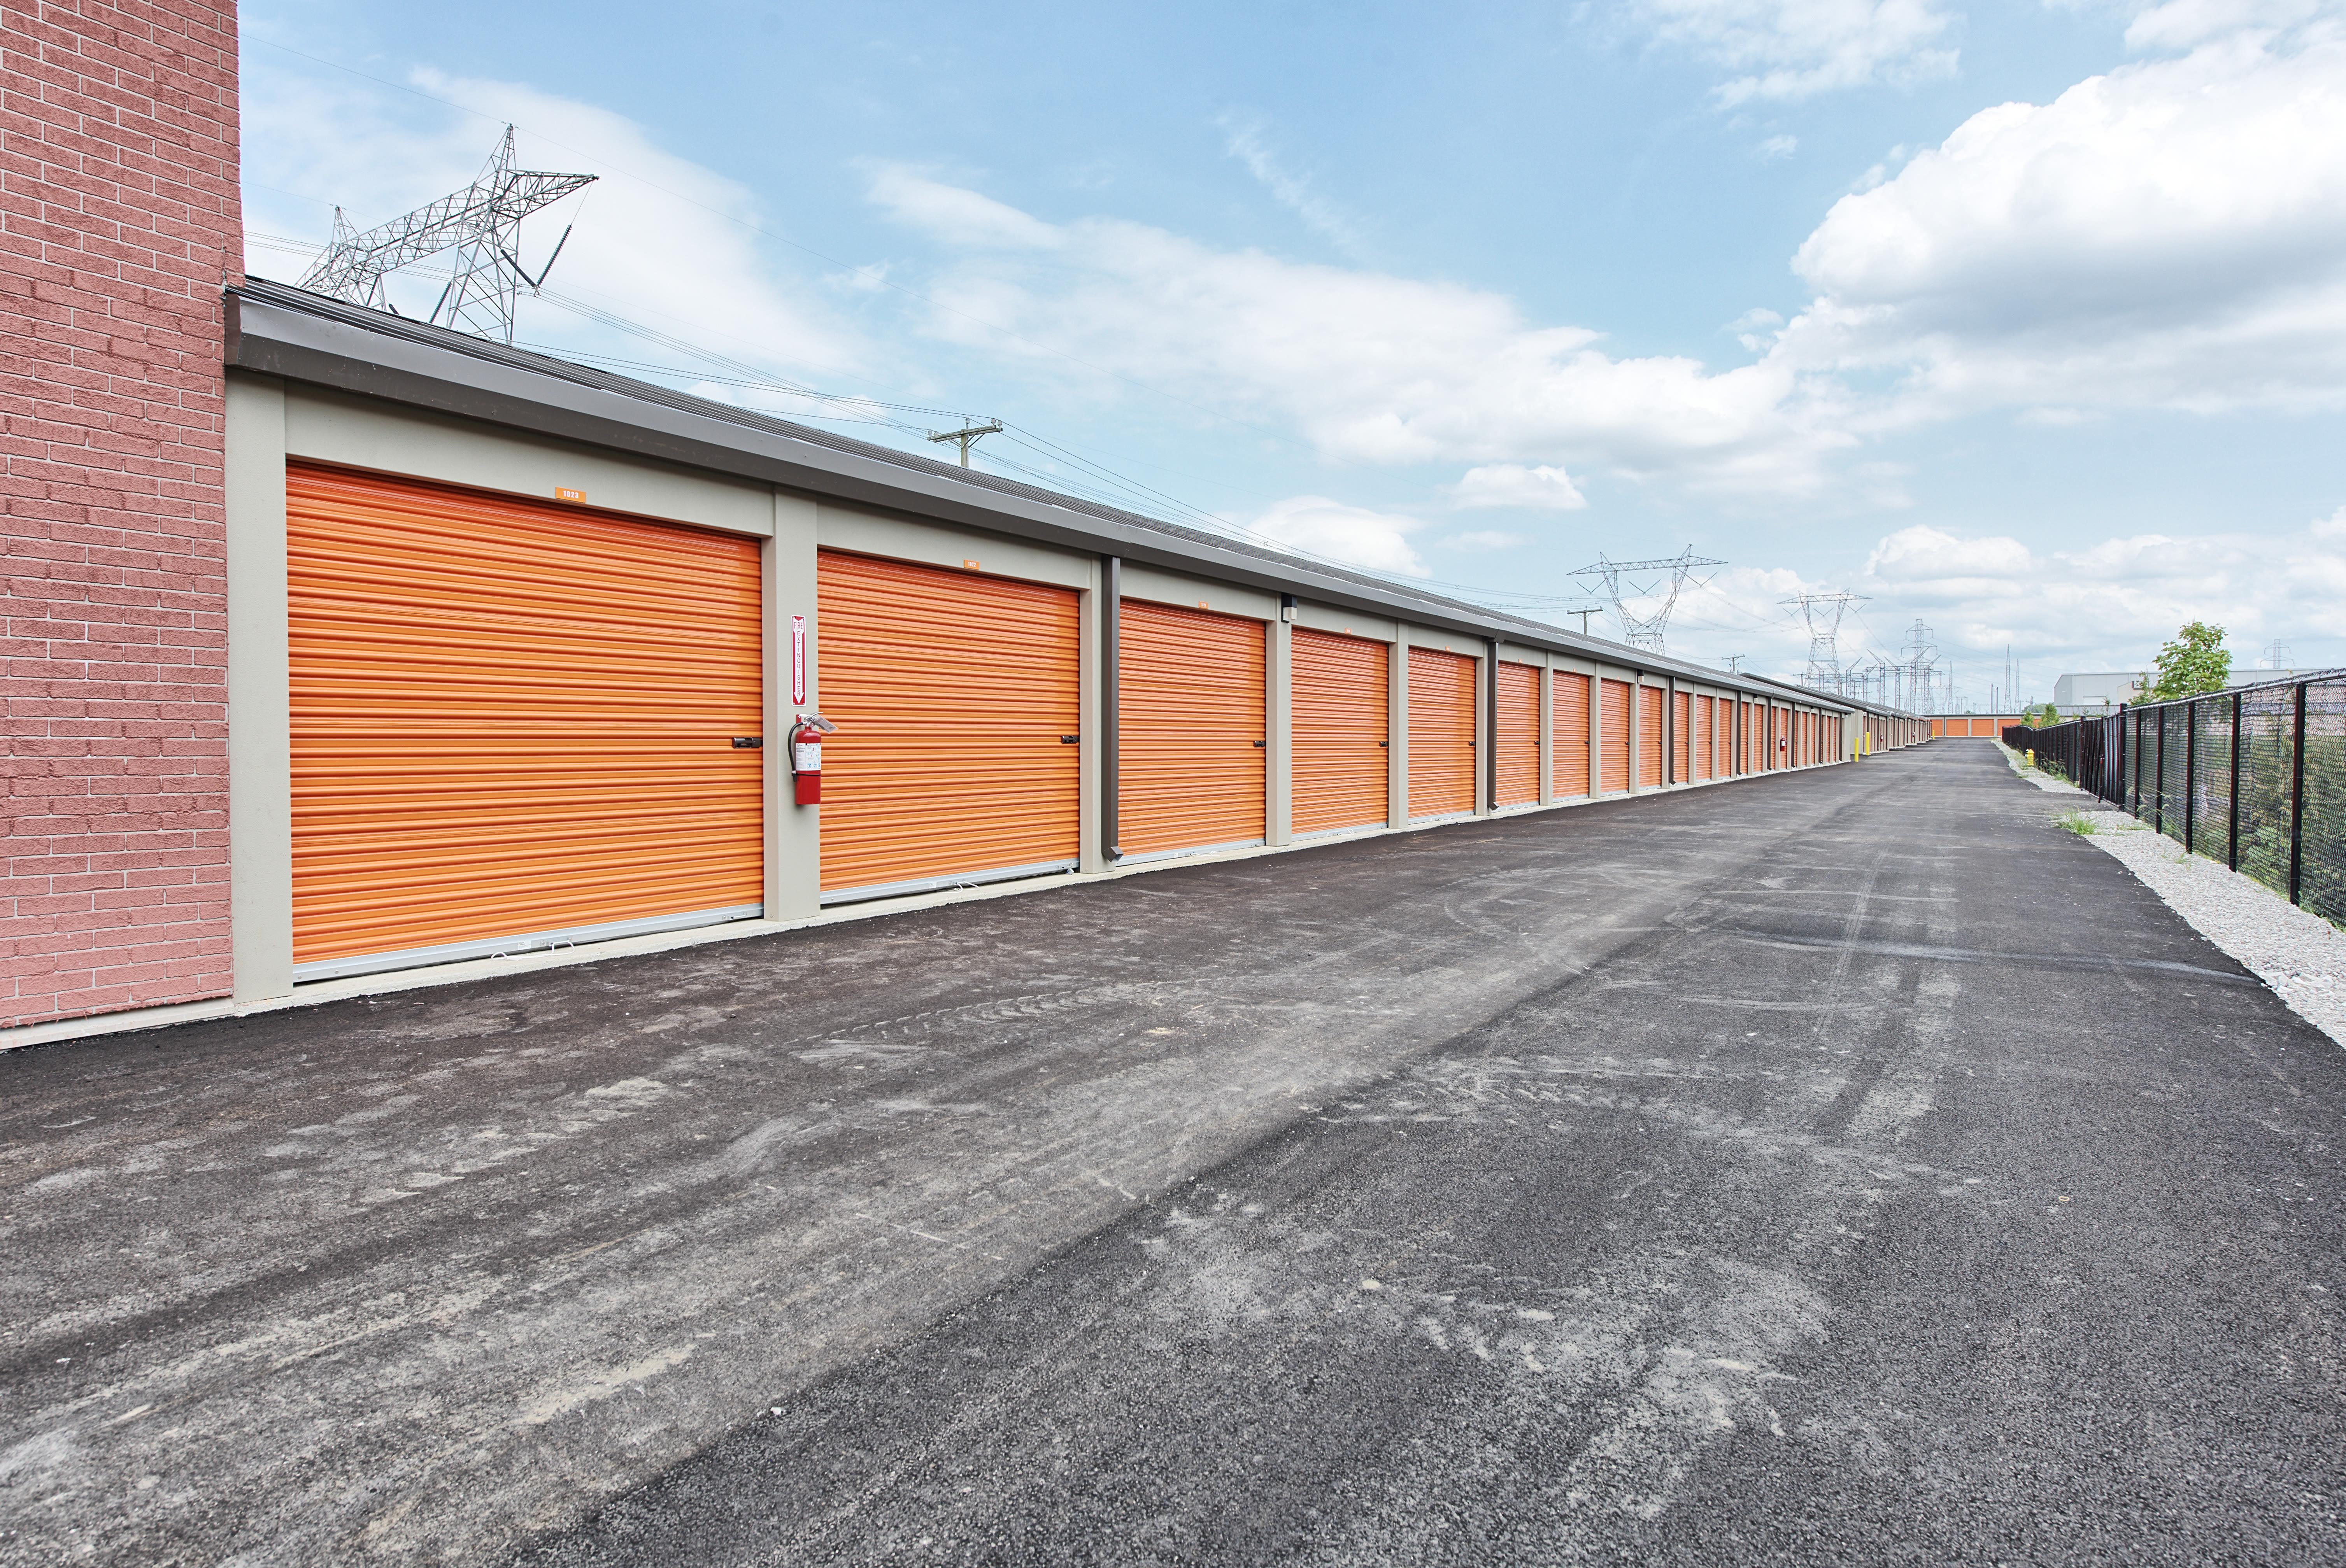 Car storage at Orange Self Storage is available